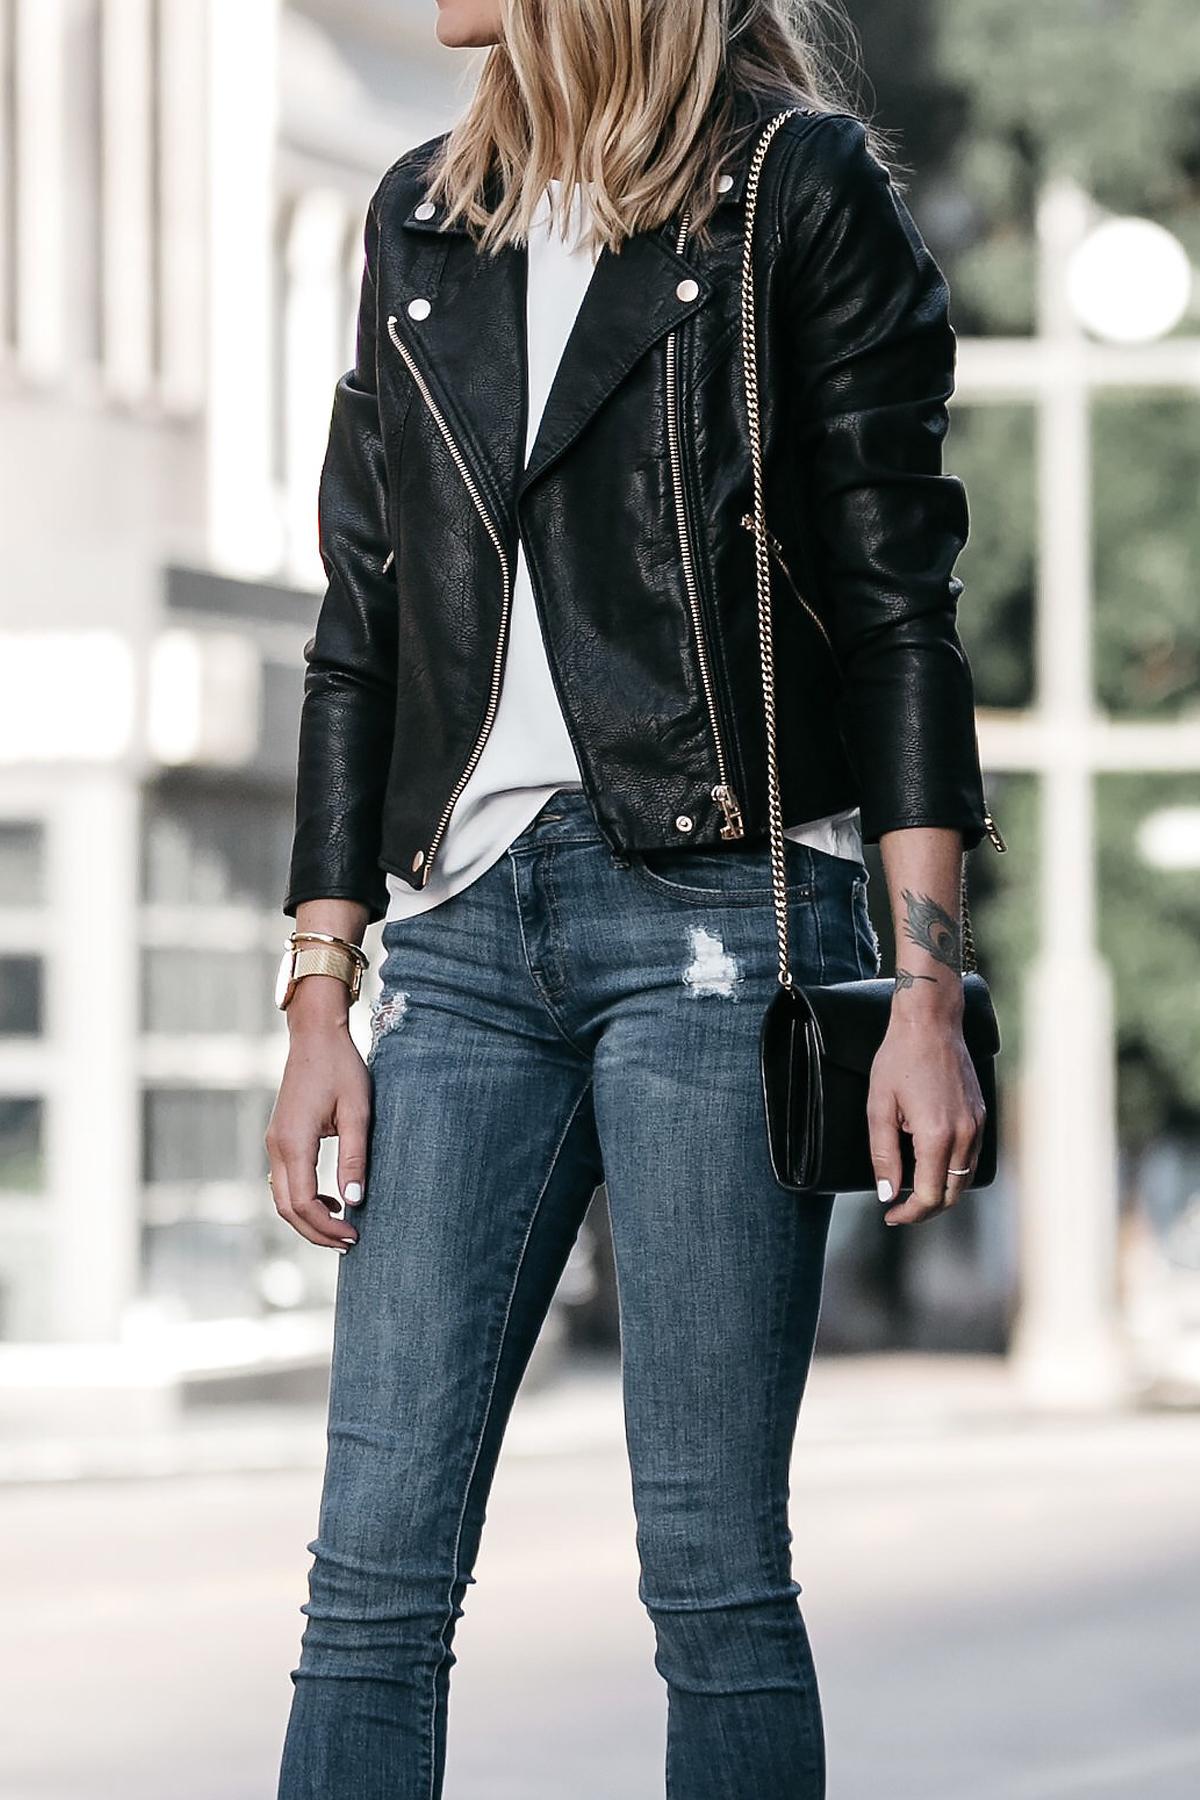 Nordstrom Anniversary Sale Black Leather Moto Jacket Denim Skinny Jeans Fashion Jackson Dallas Blogger Fashion Blogger